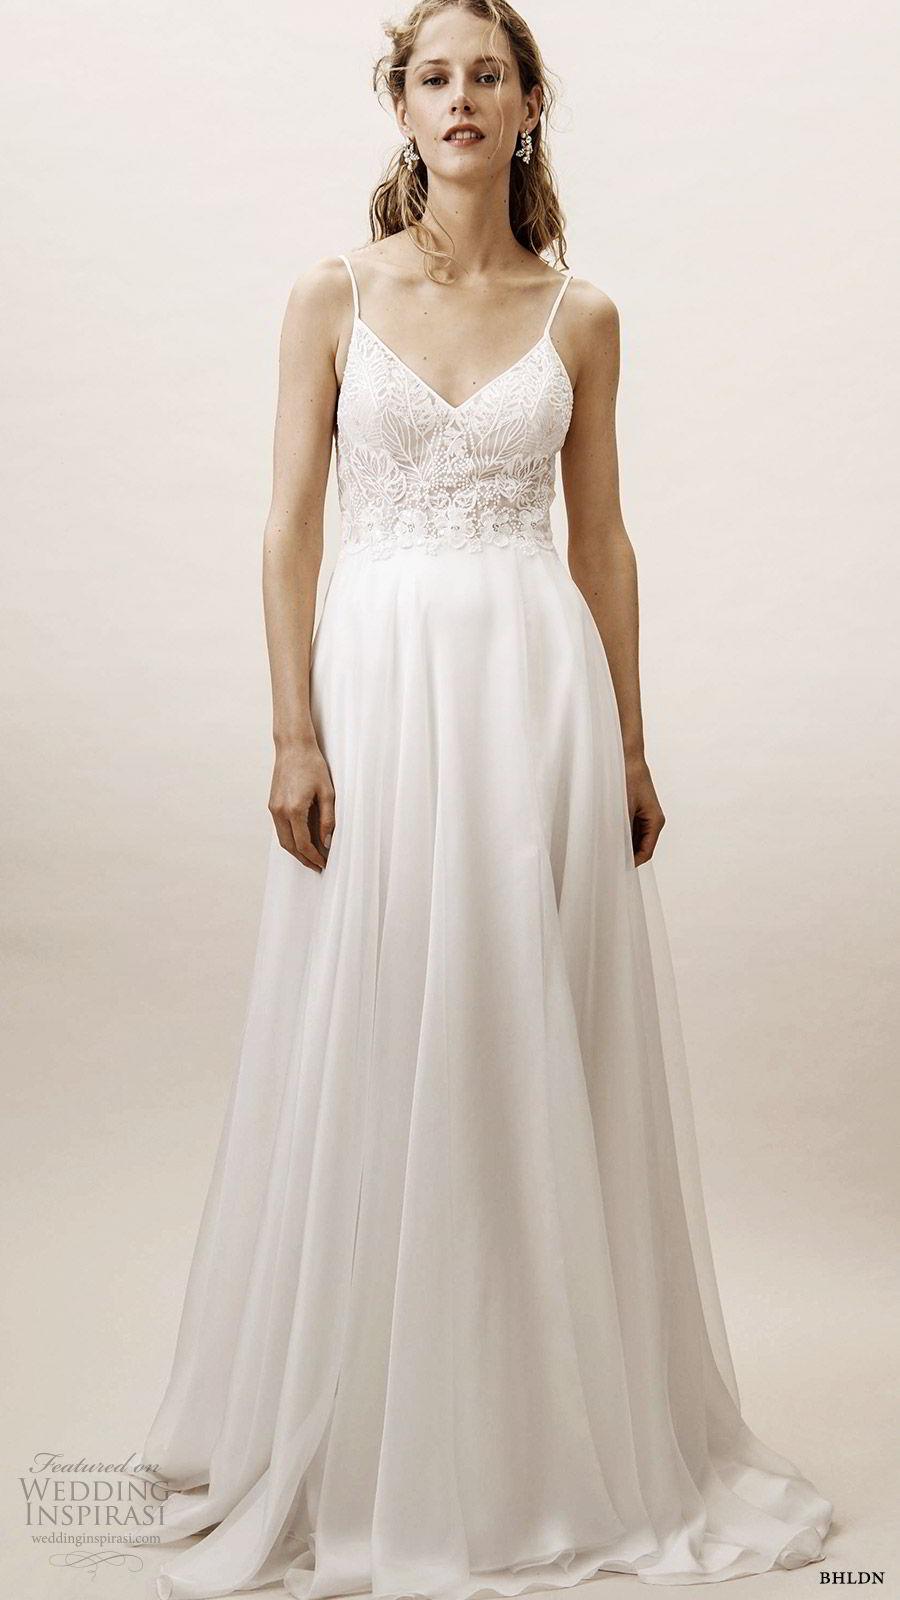 bhldn spring 2019 bridal sleeveless thin straps sweetheart v neckline embellished bodice a line wedding dress elegant romantic scoop back (4) mv